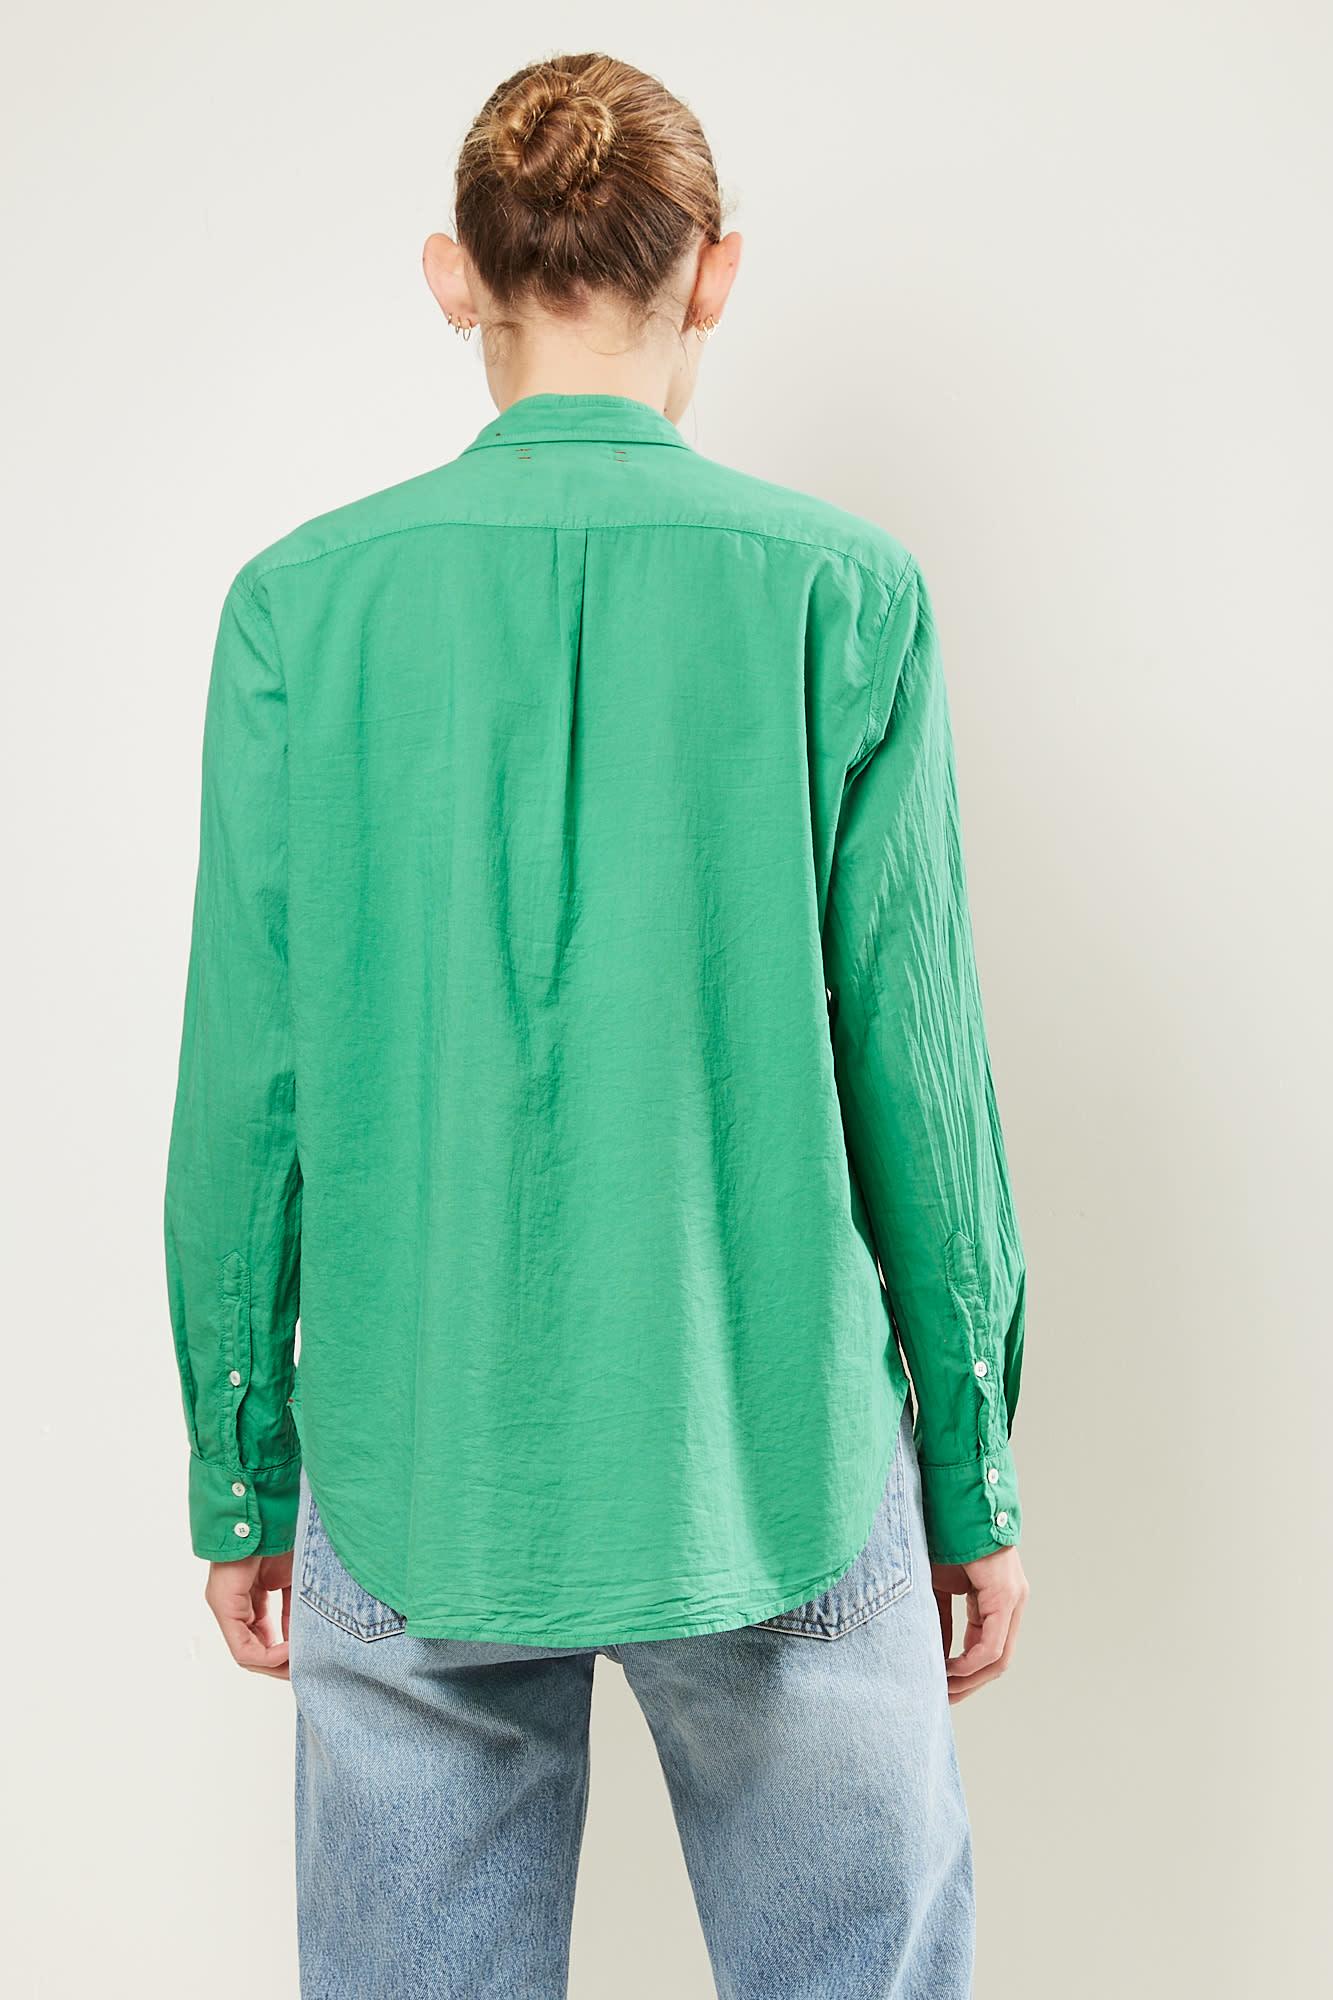 Xirena - Beau cotton poplin shirt Palm Green